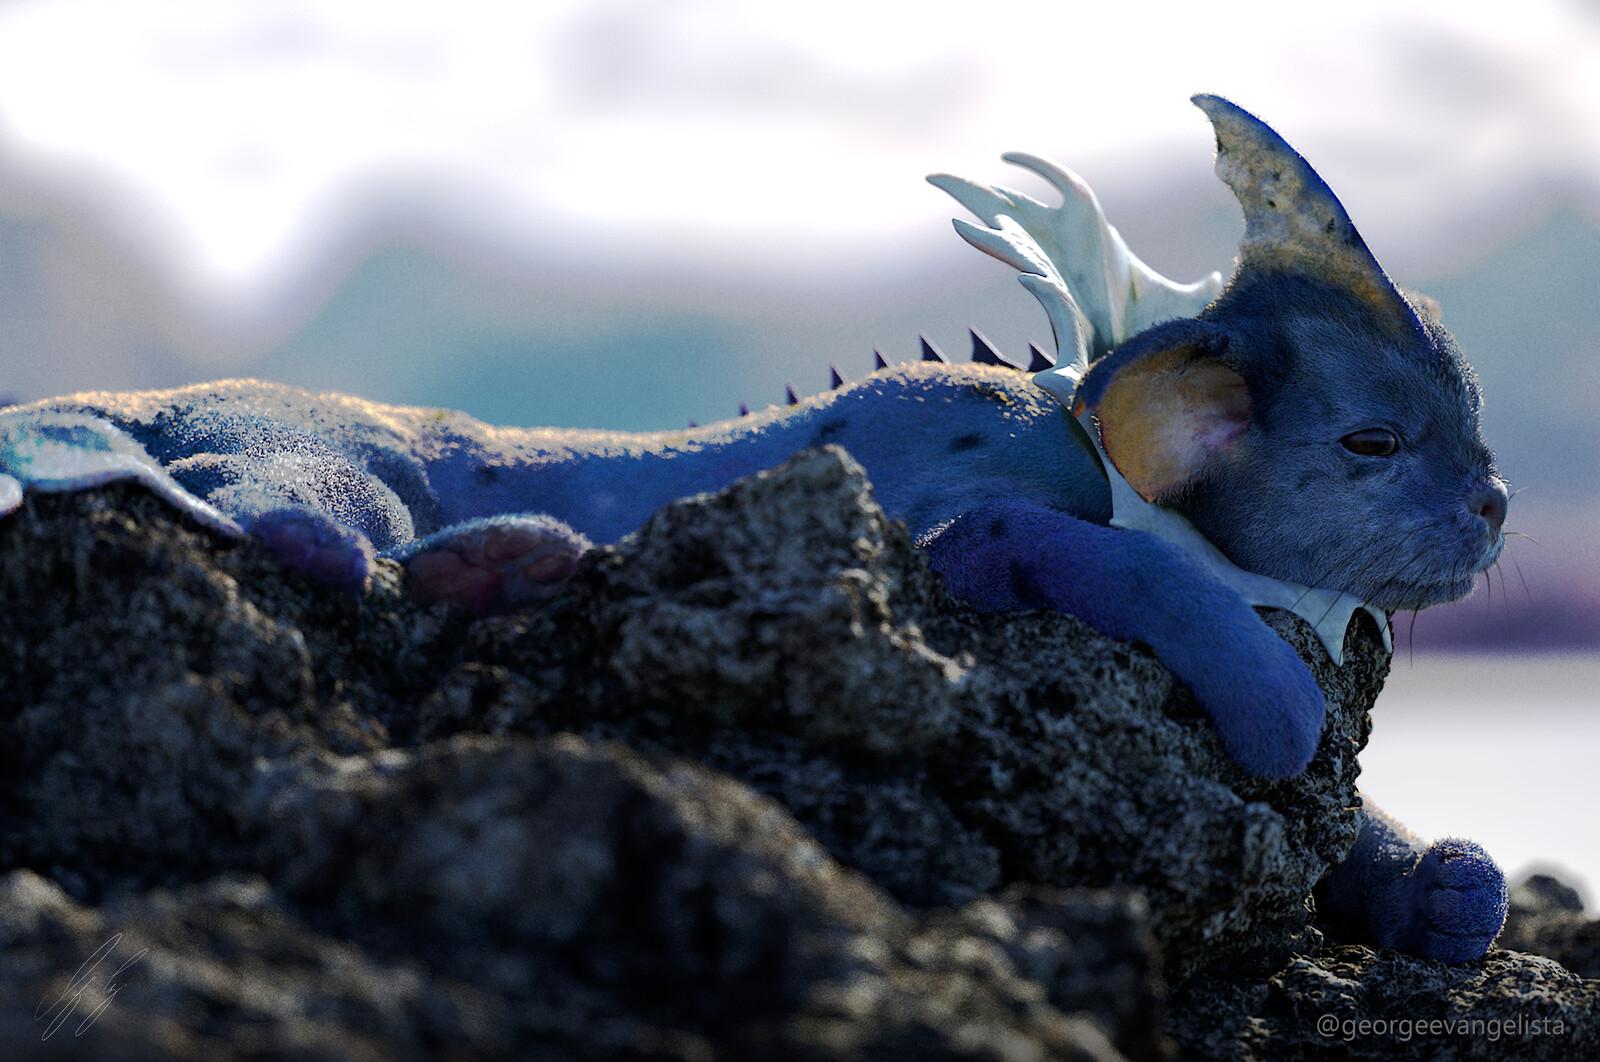 Coastal Life 2 - Vaporeon